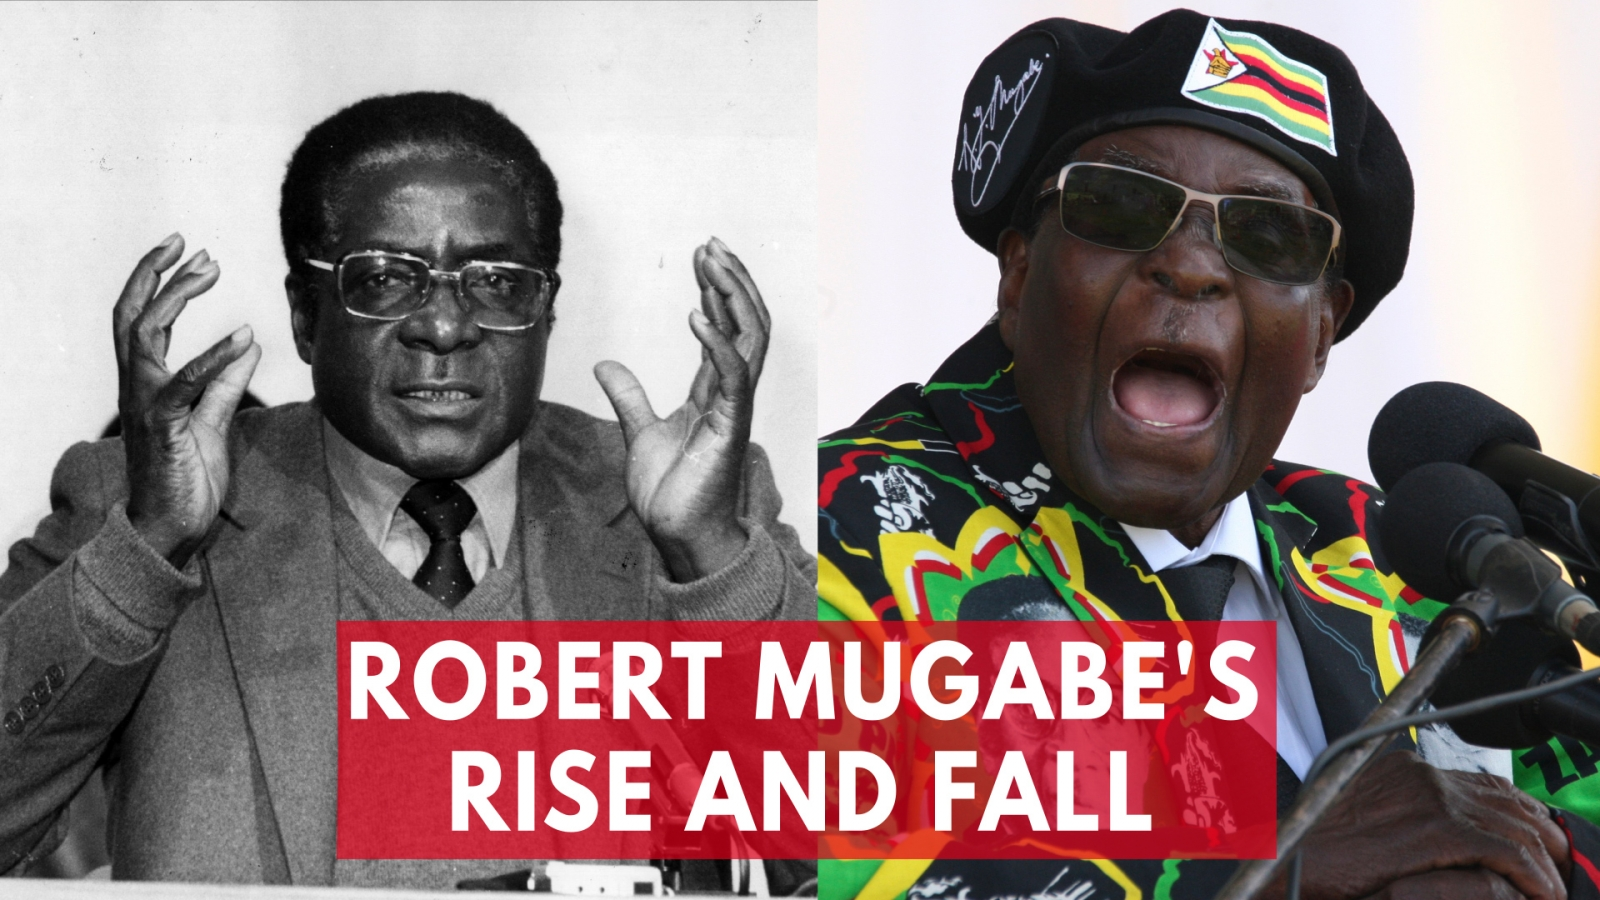 President Robert Mugabe's rise and fall